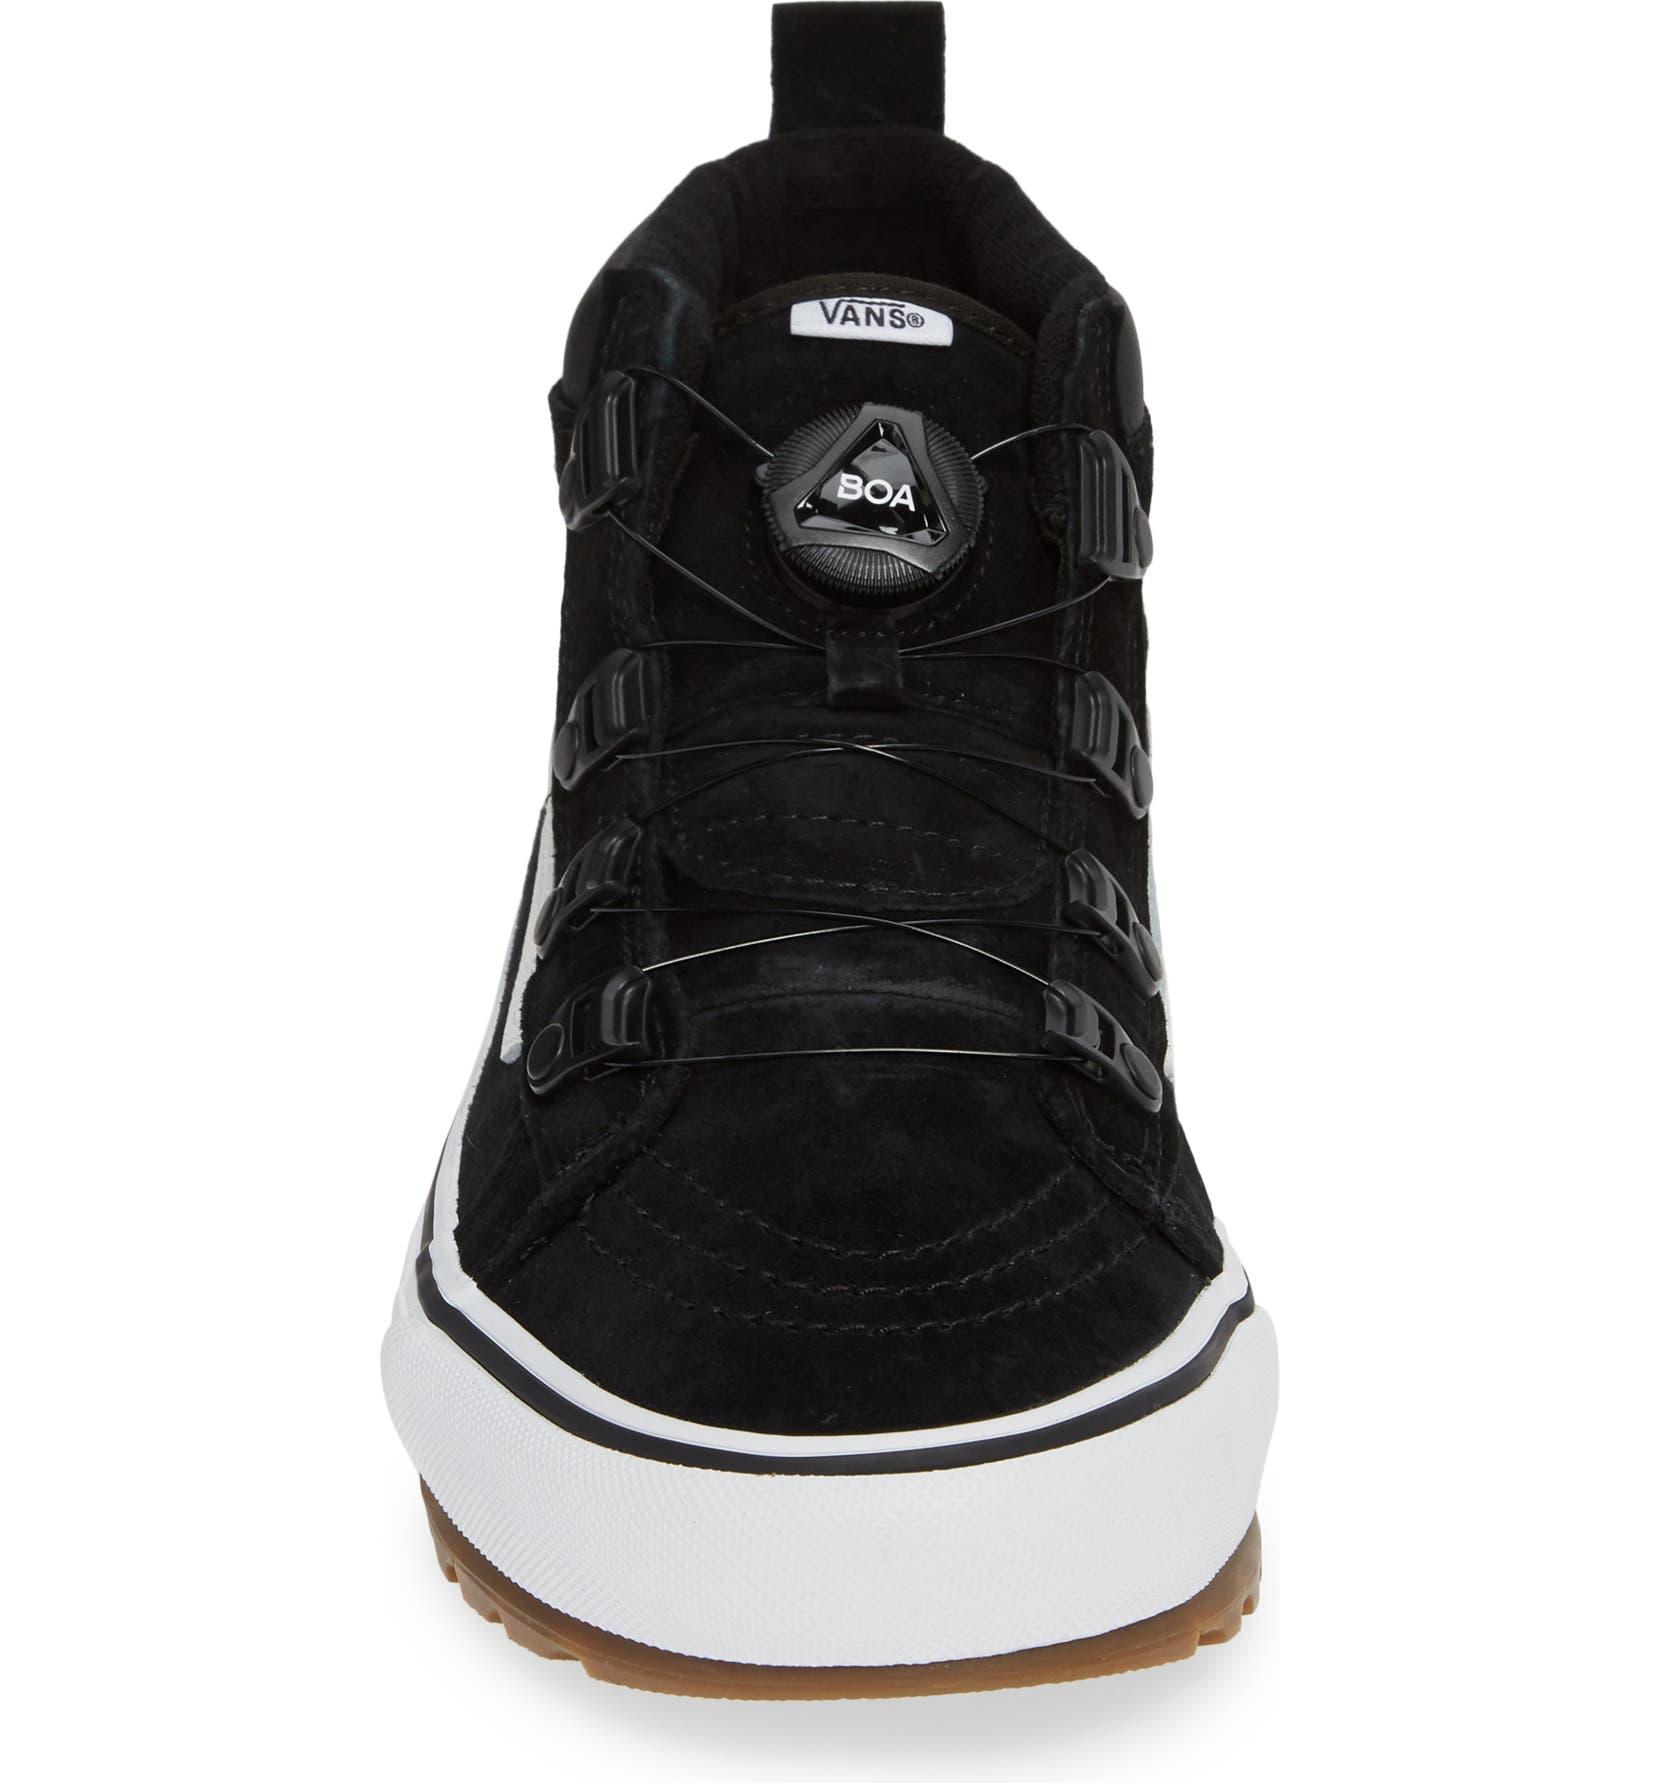 55b5c9433167c7 Vans Sk8-Hi MTE Boa Sneaker (Men)